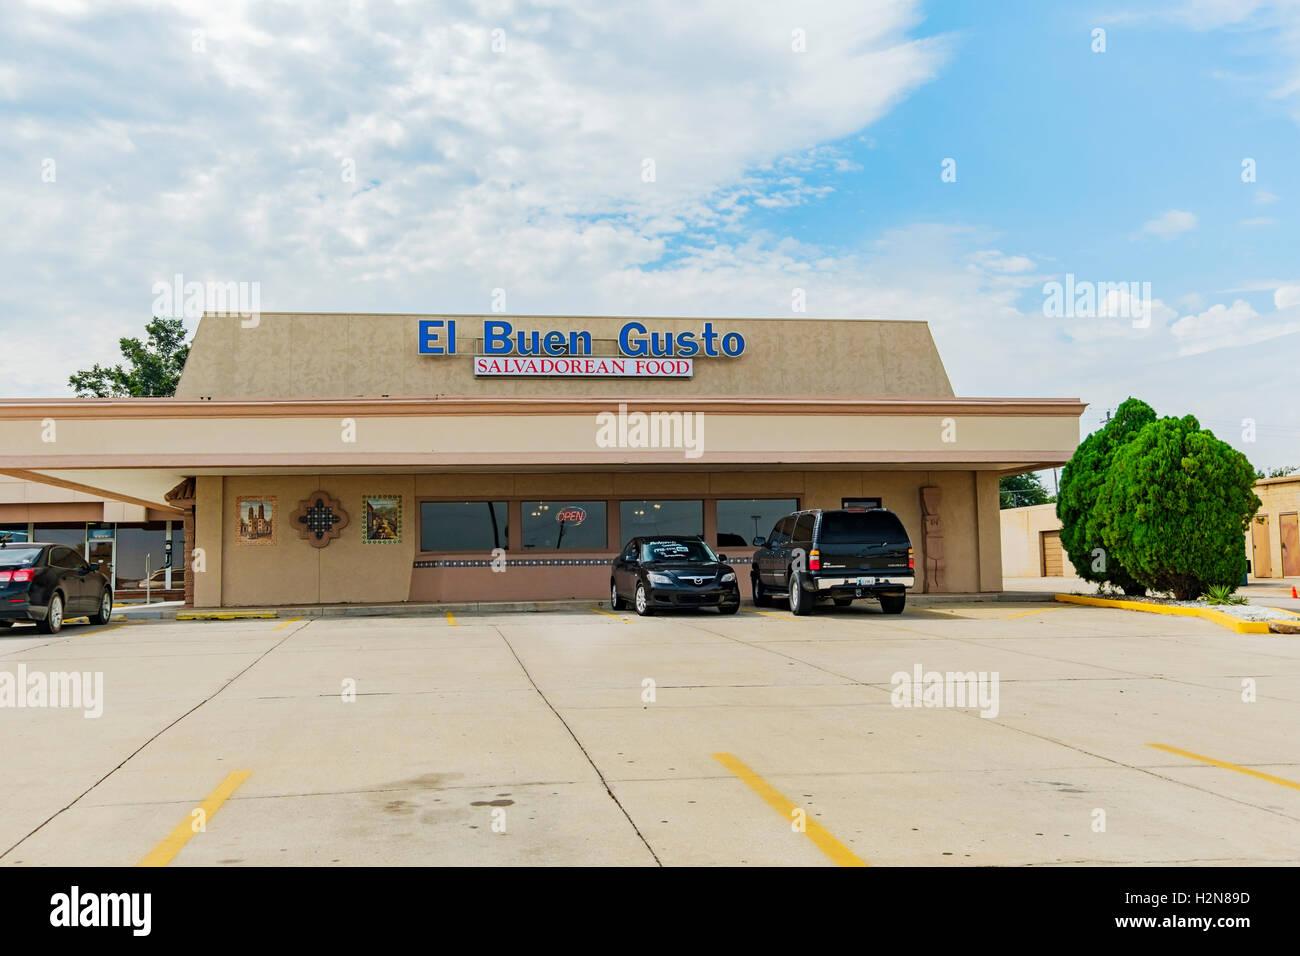 Das äußere des El Buen Gusto salvadorianischen Restaurant 2116 SW 74, Oklahoma City, Oklahoma, USA. Stockbild